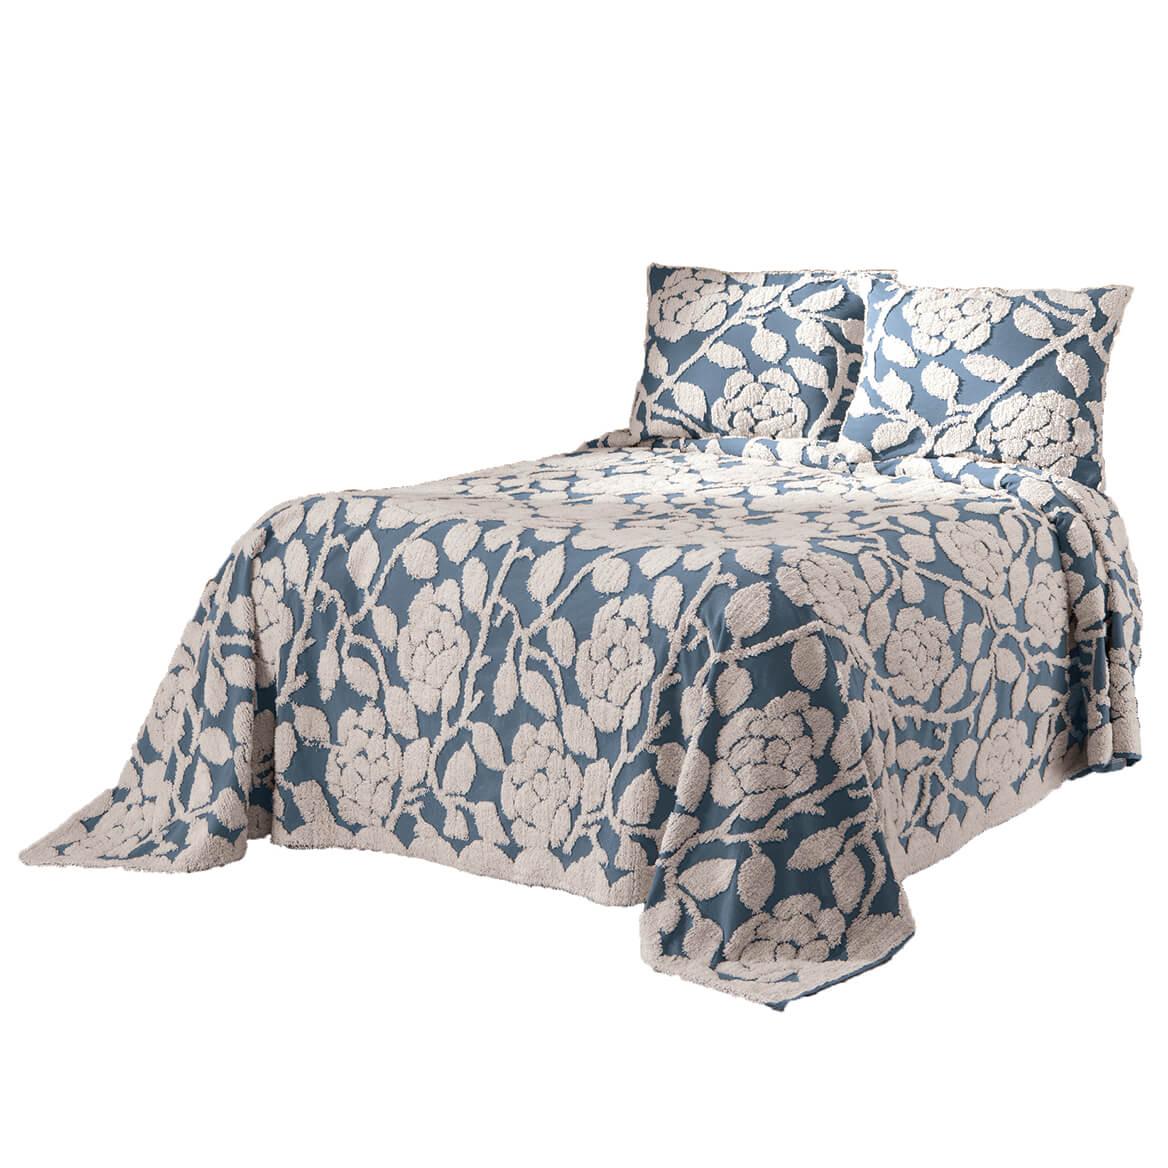 The-Grace-Chenille-Bedspread-by-OakRidgeTM thumbnail 34